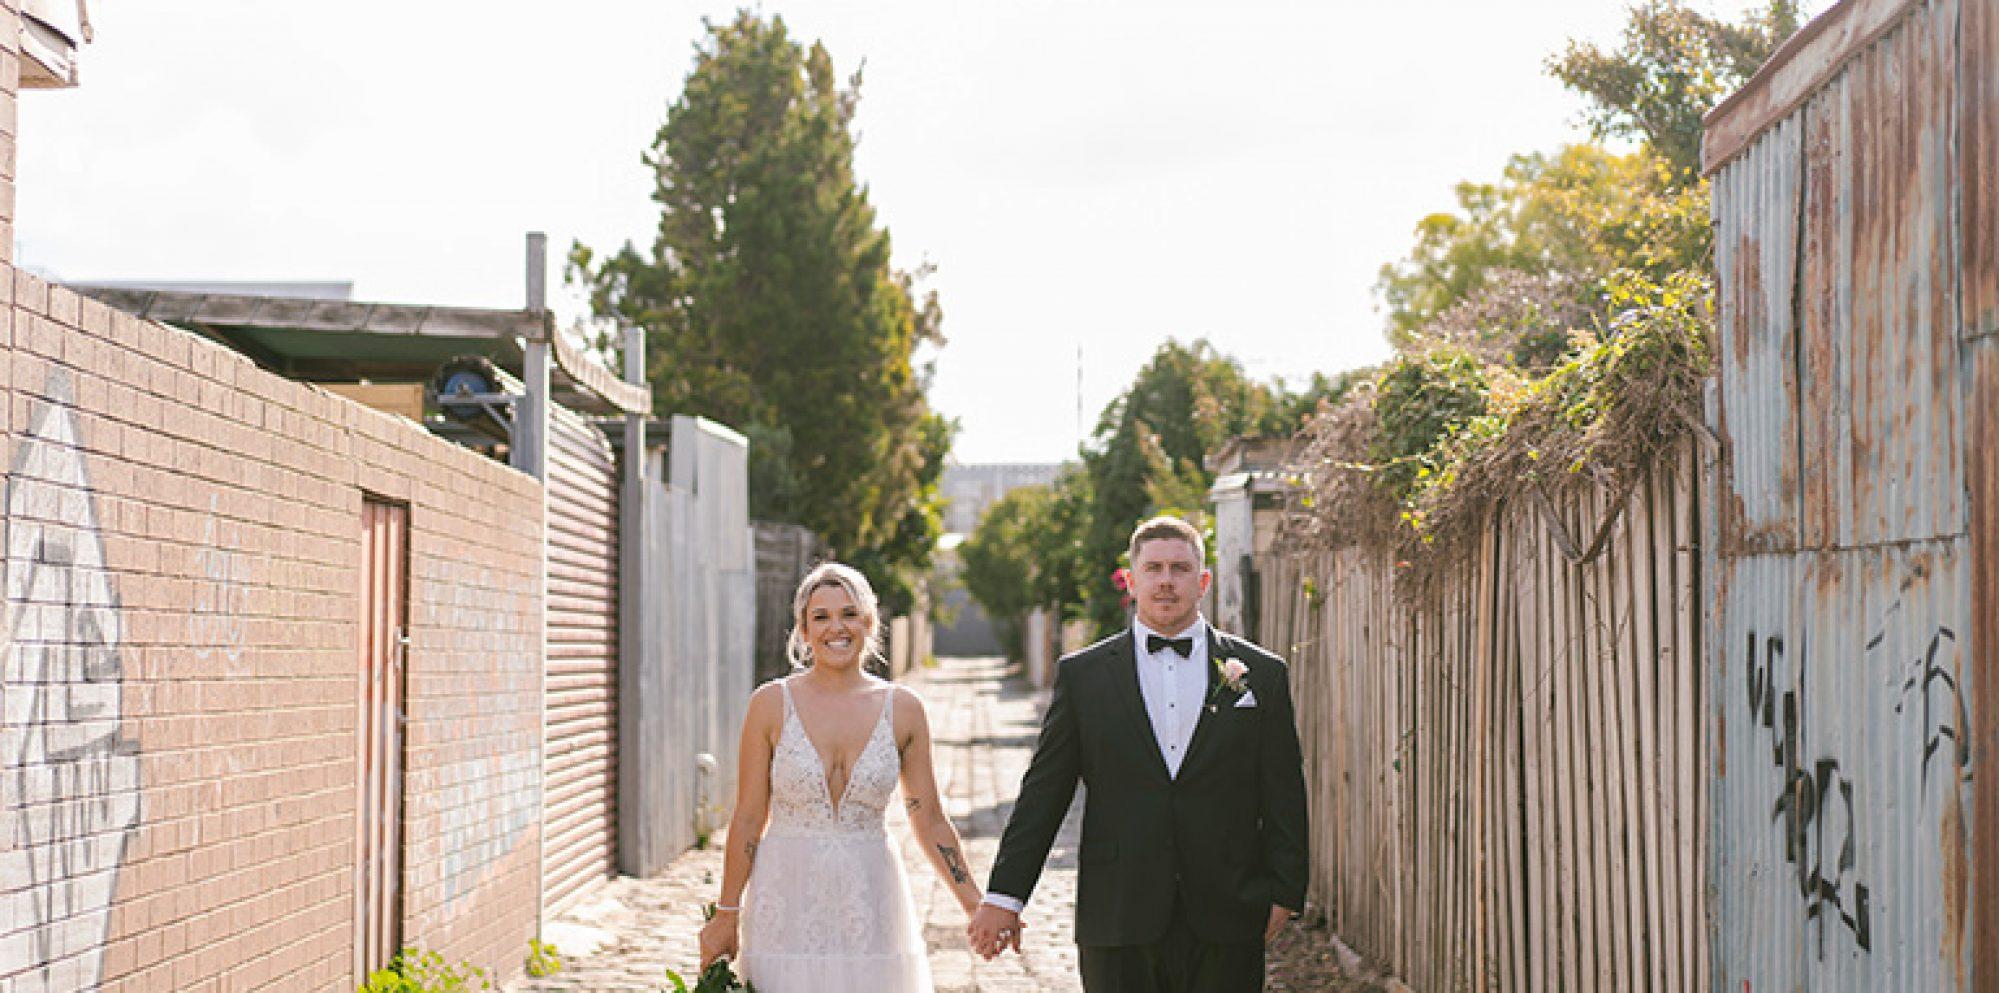 Hollie & brendan wedding photography @ post office hotel